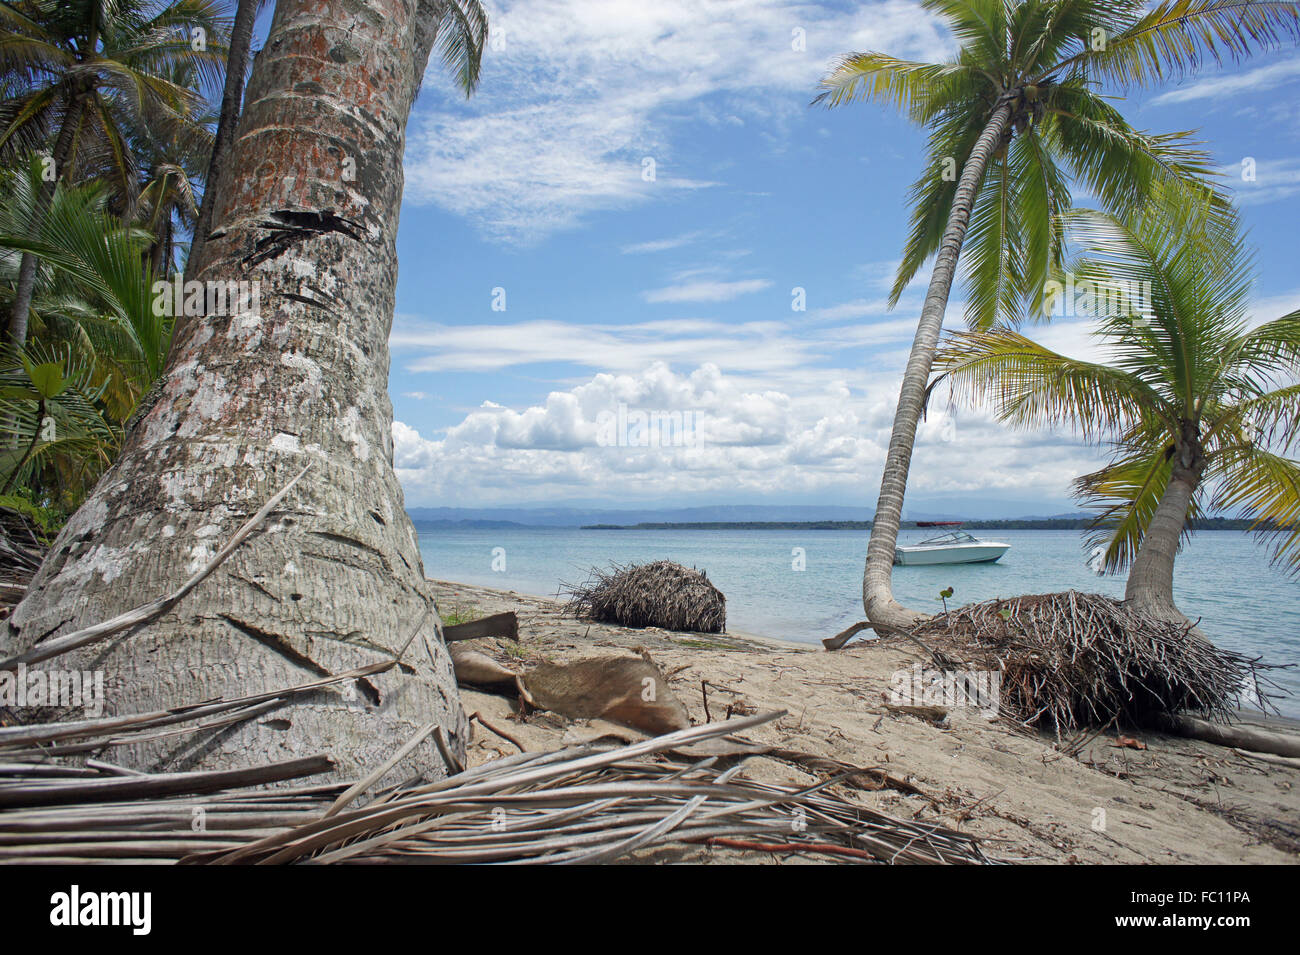 caribbean vacation - Stock Image